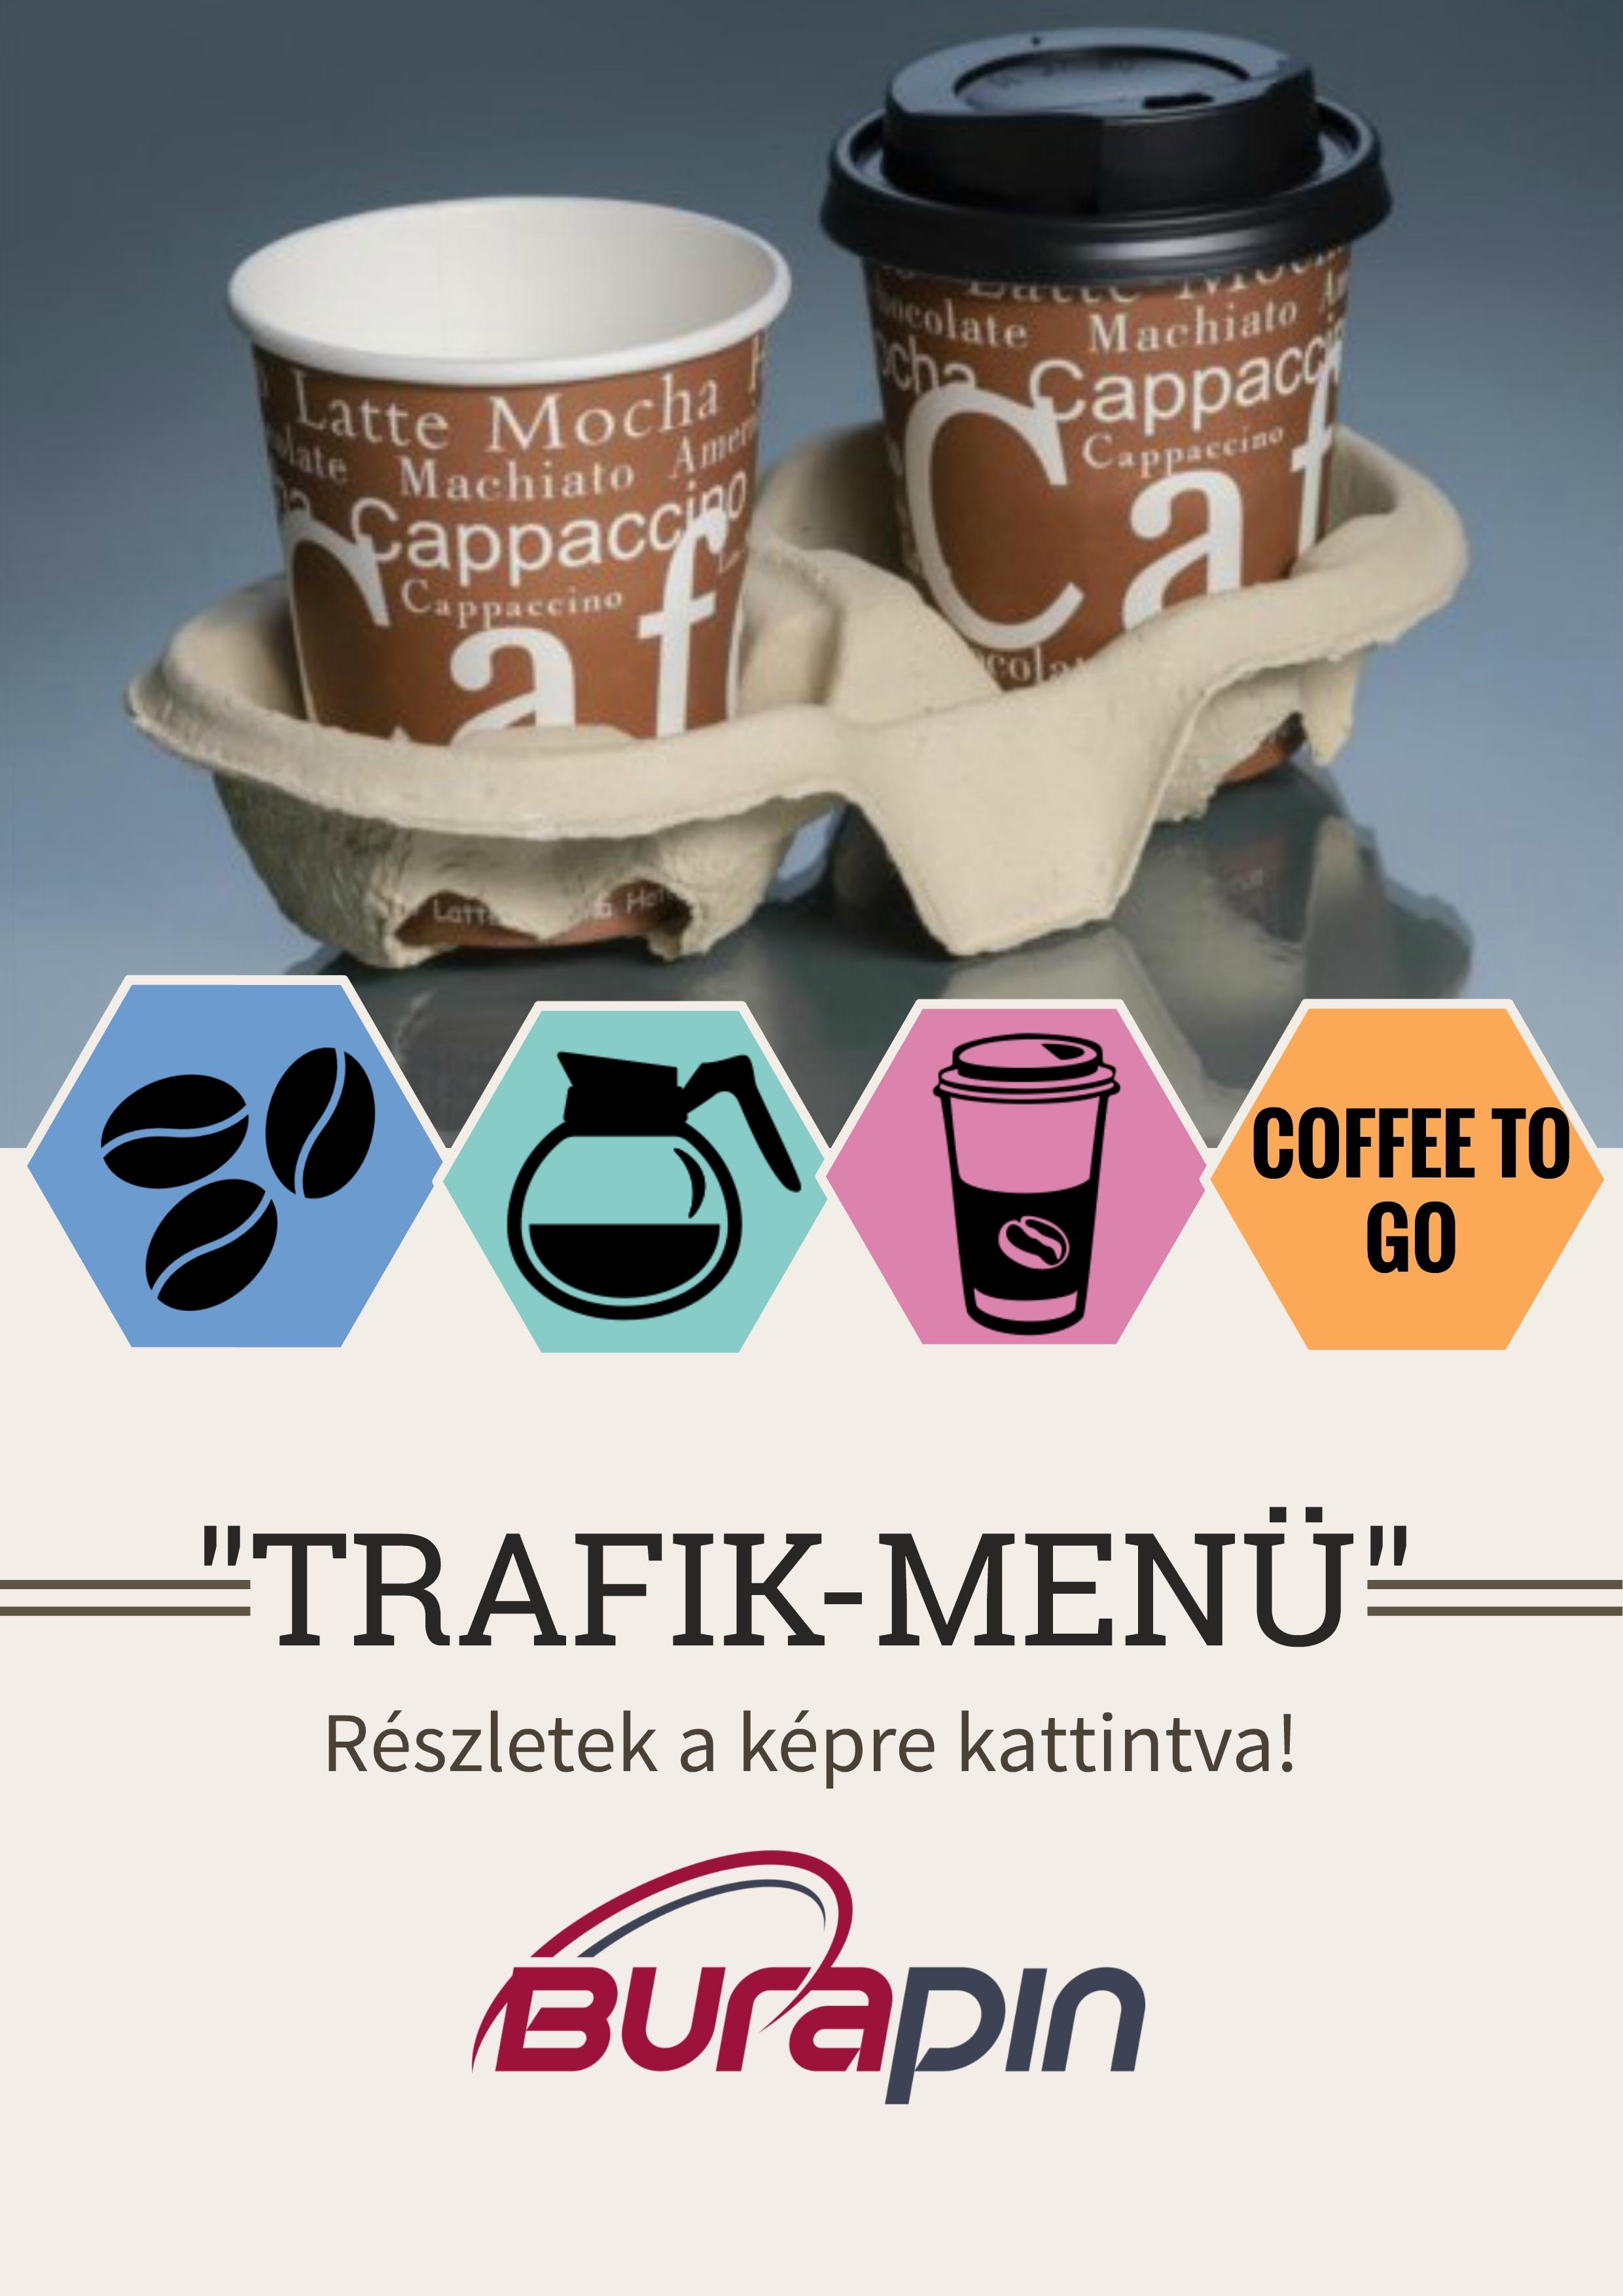 Trafik menü